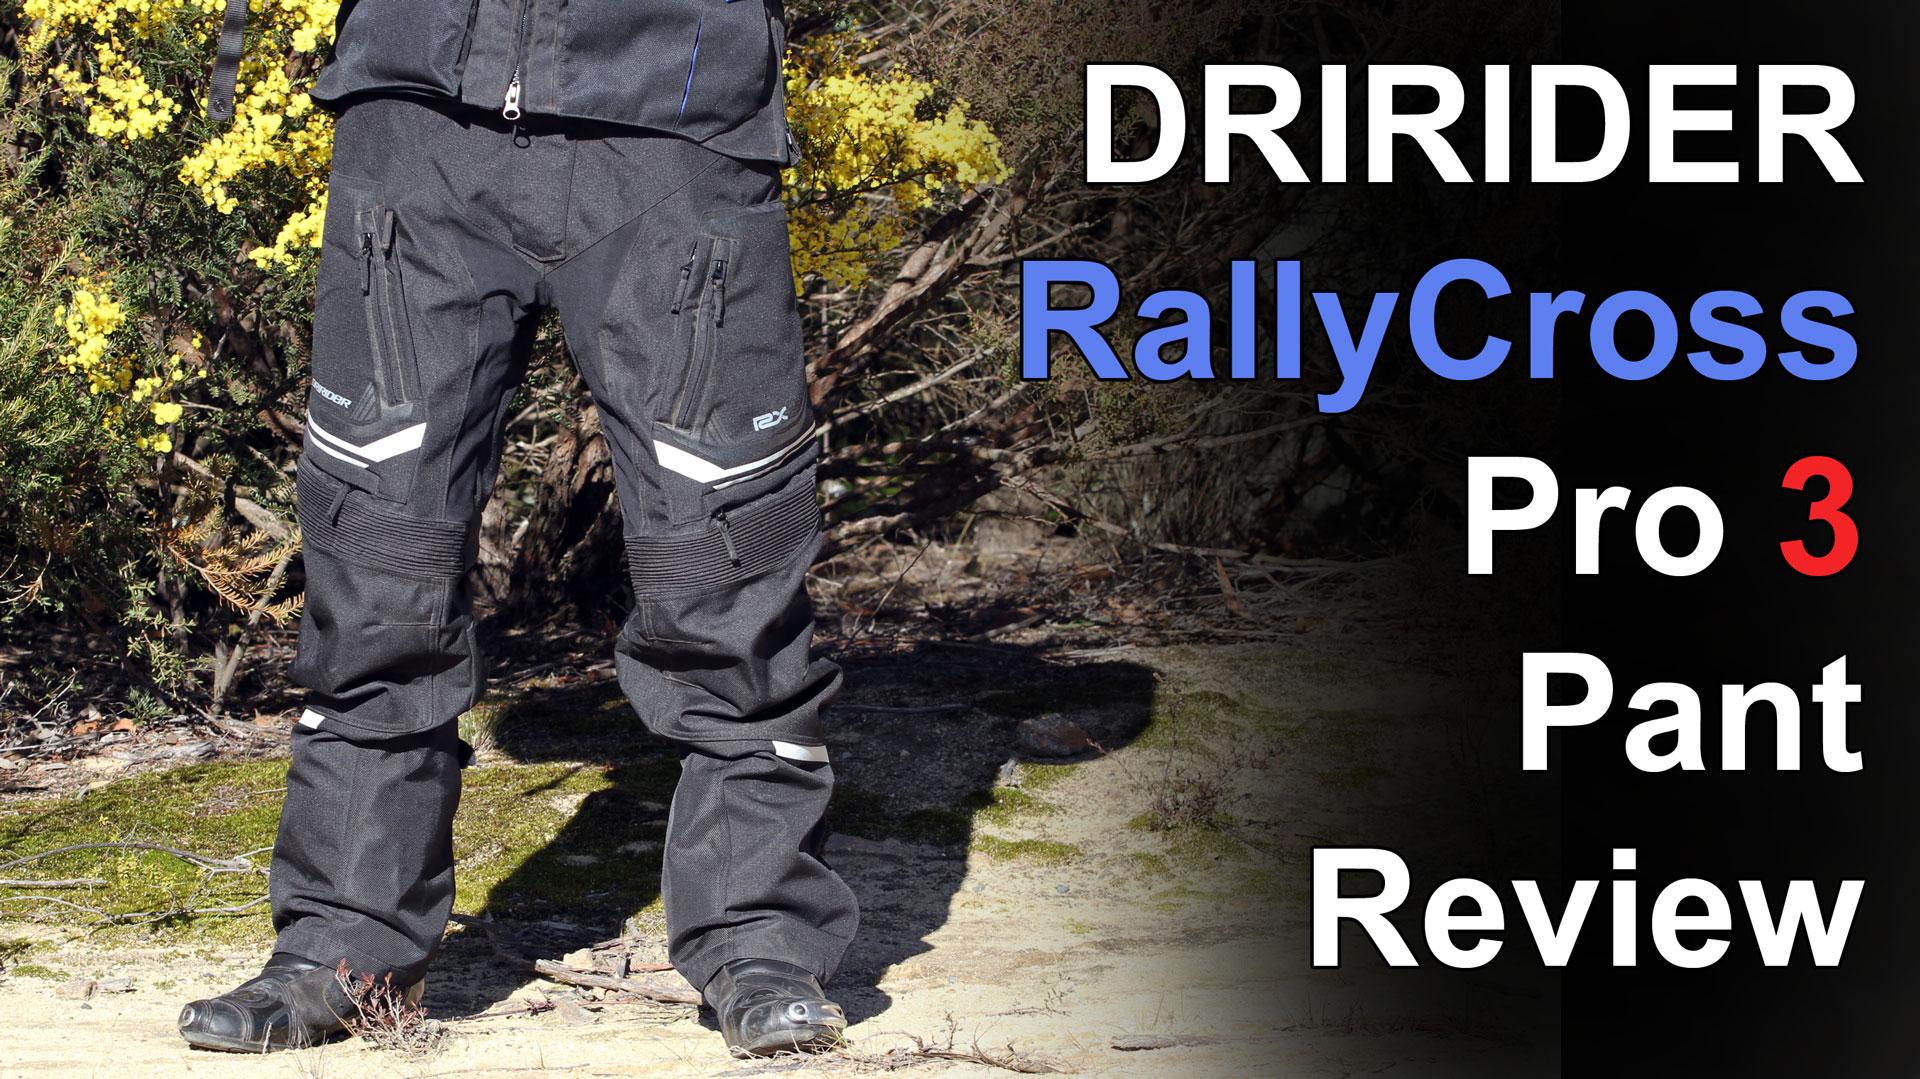 DRIRIDER RallyCross Pro 3 Pant Review